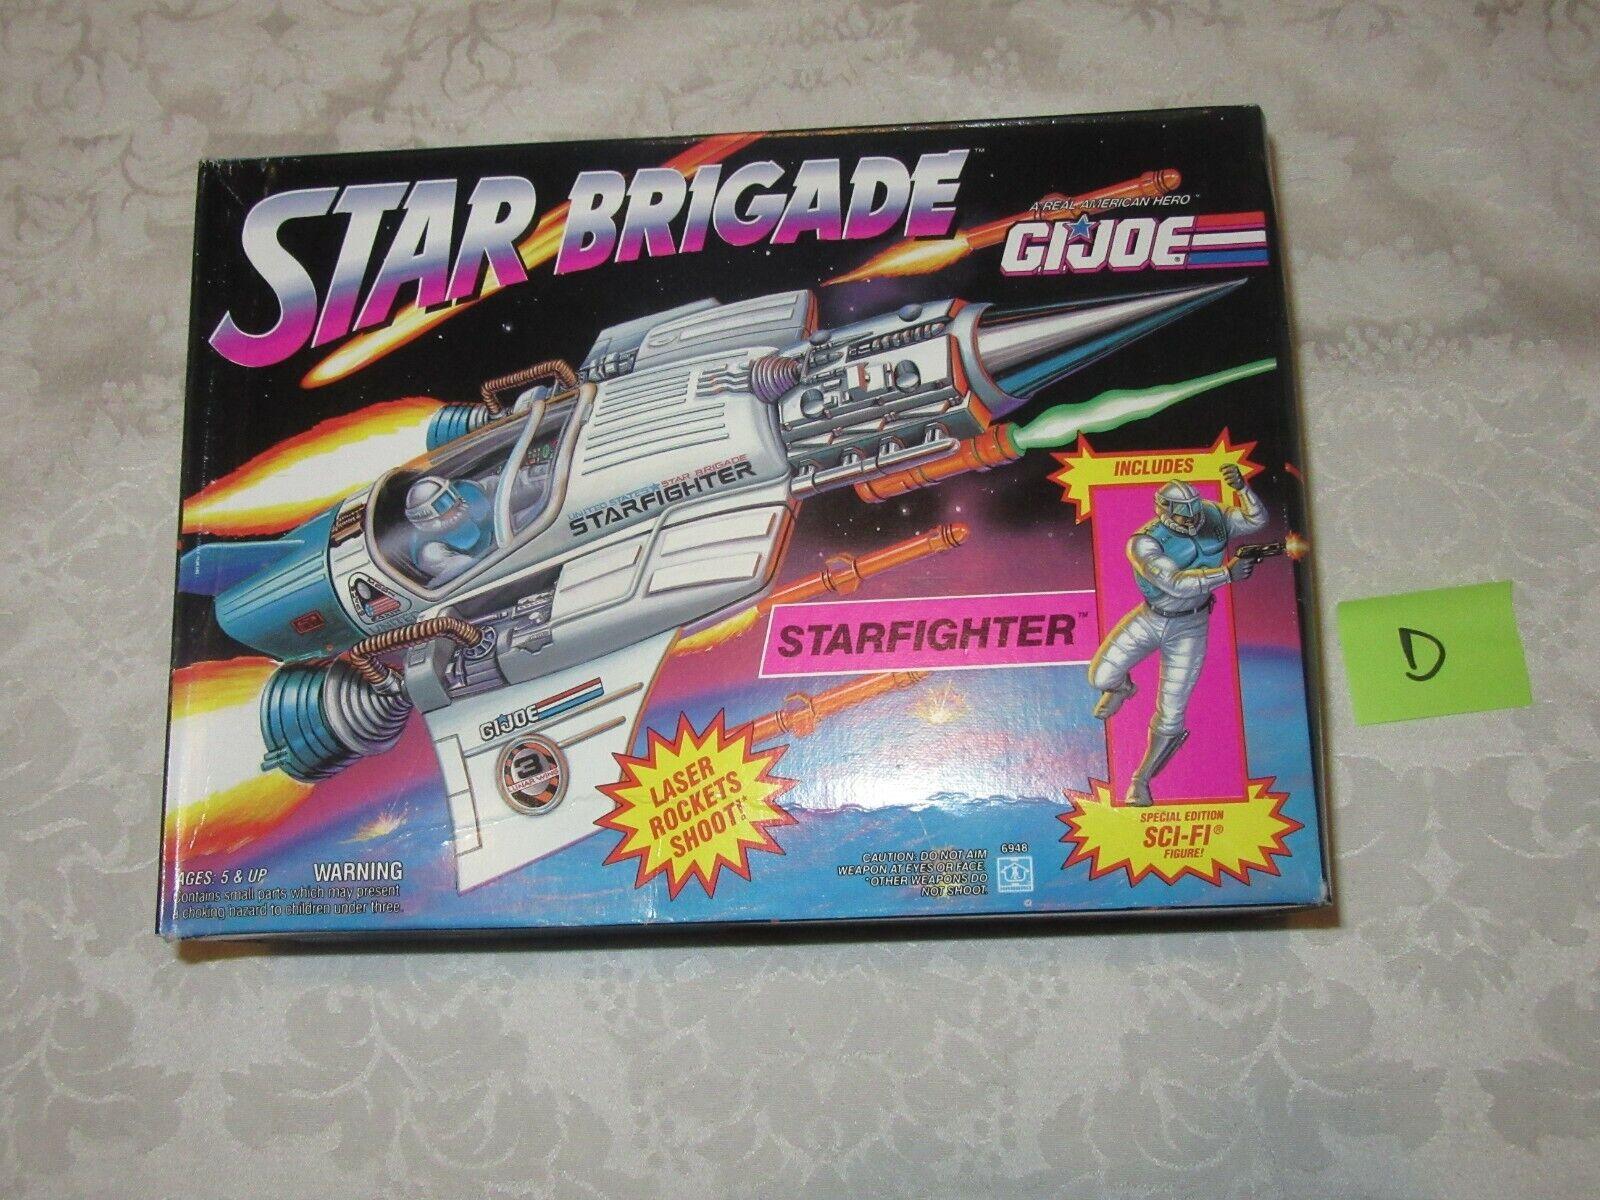 Hasbro G.I. GI Joe estrella Brigade estrellacombatiente specialee edizione SciFi D cifra